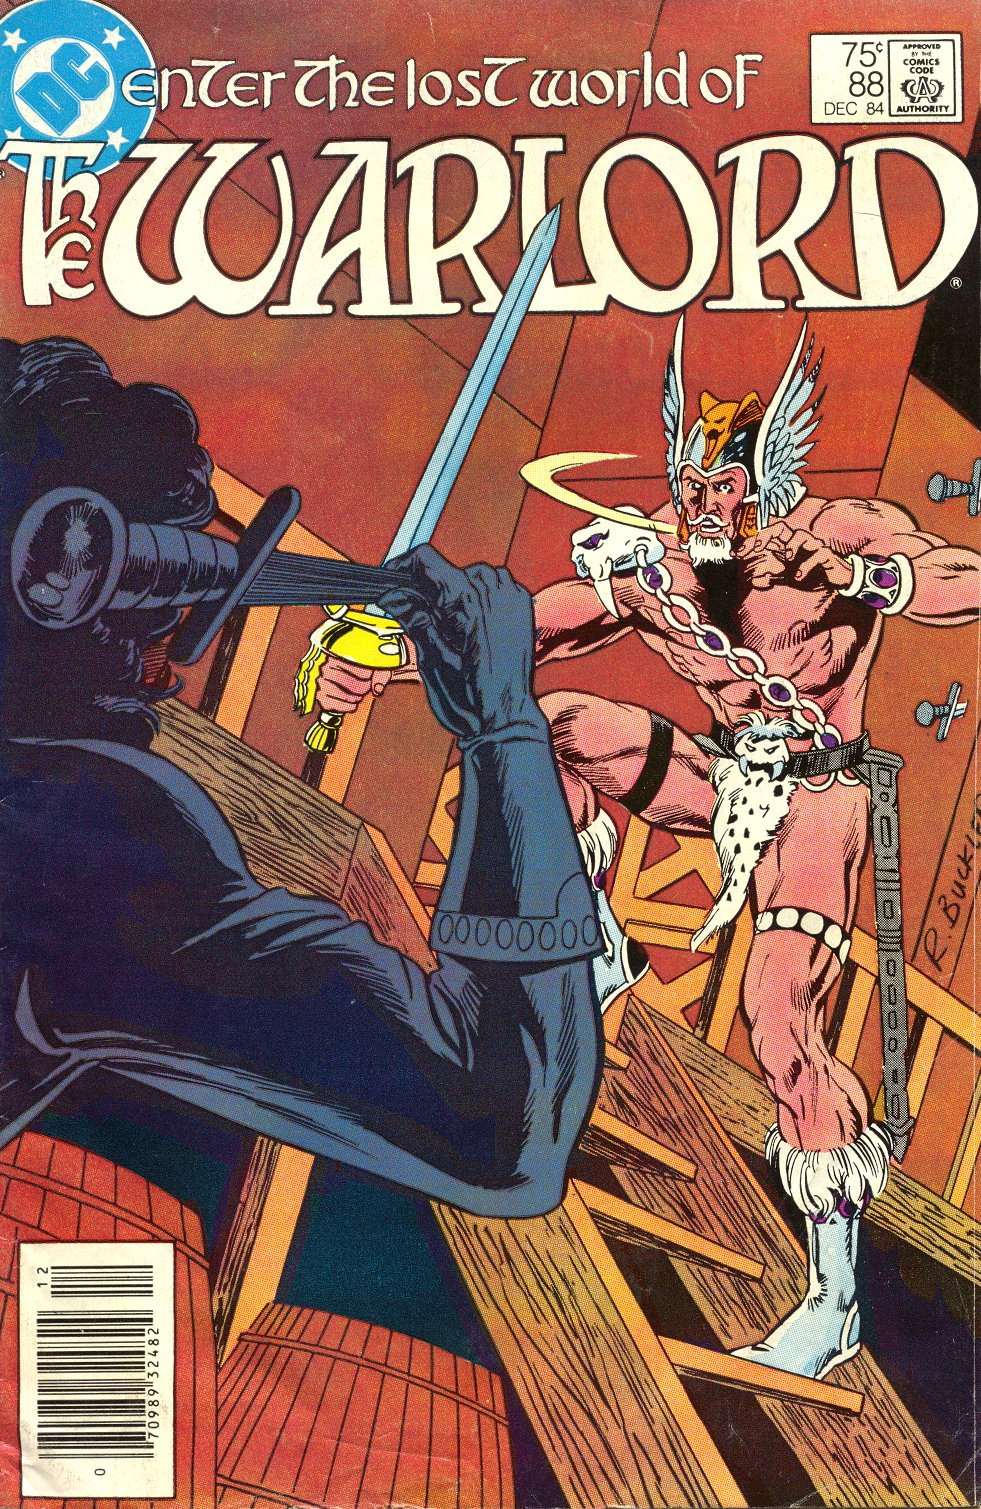 Warlord (1976) 88 Page 1